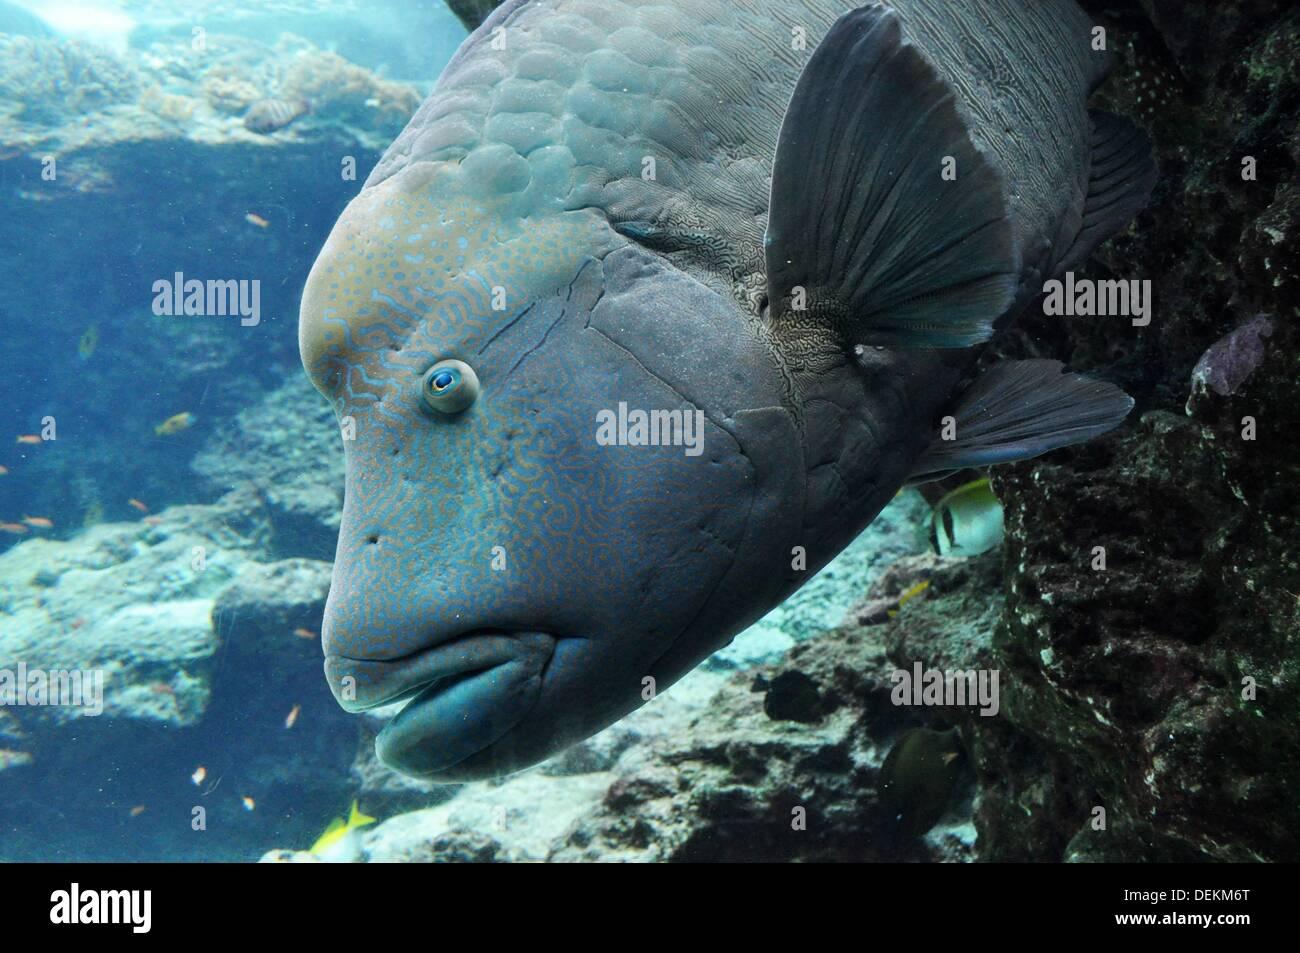 Okinawa Japan Tropical Fish At Okinawa Churaumi Aquarium Stock